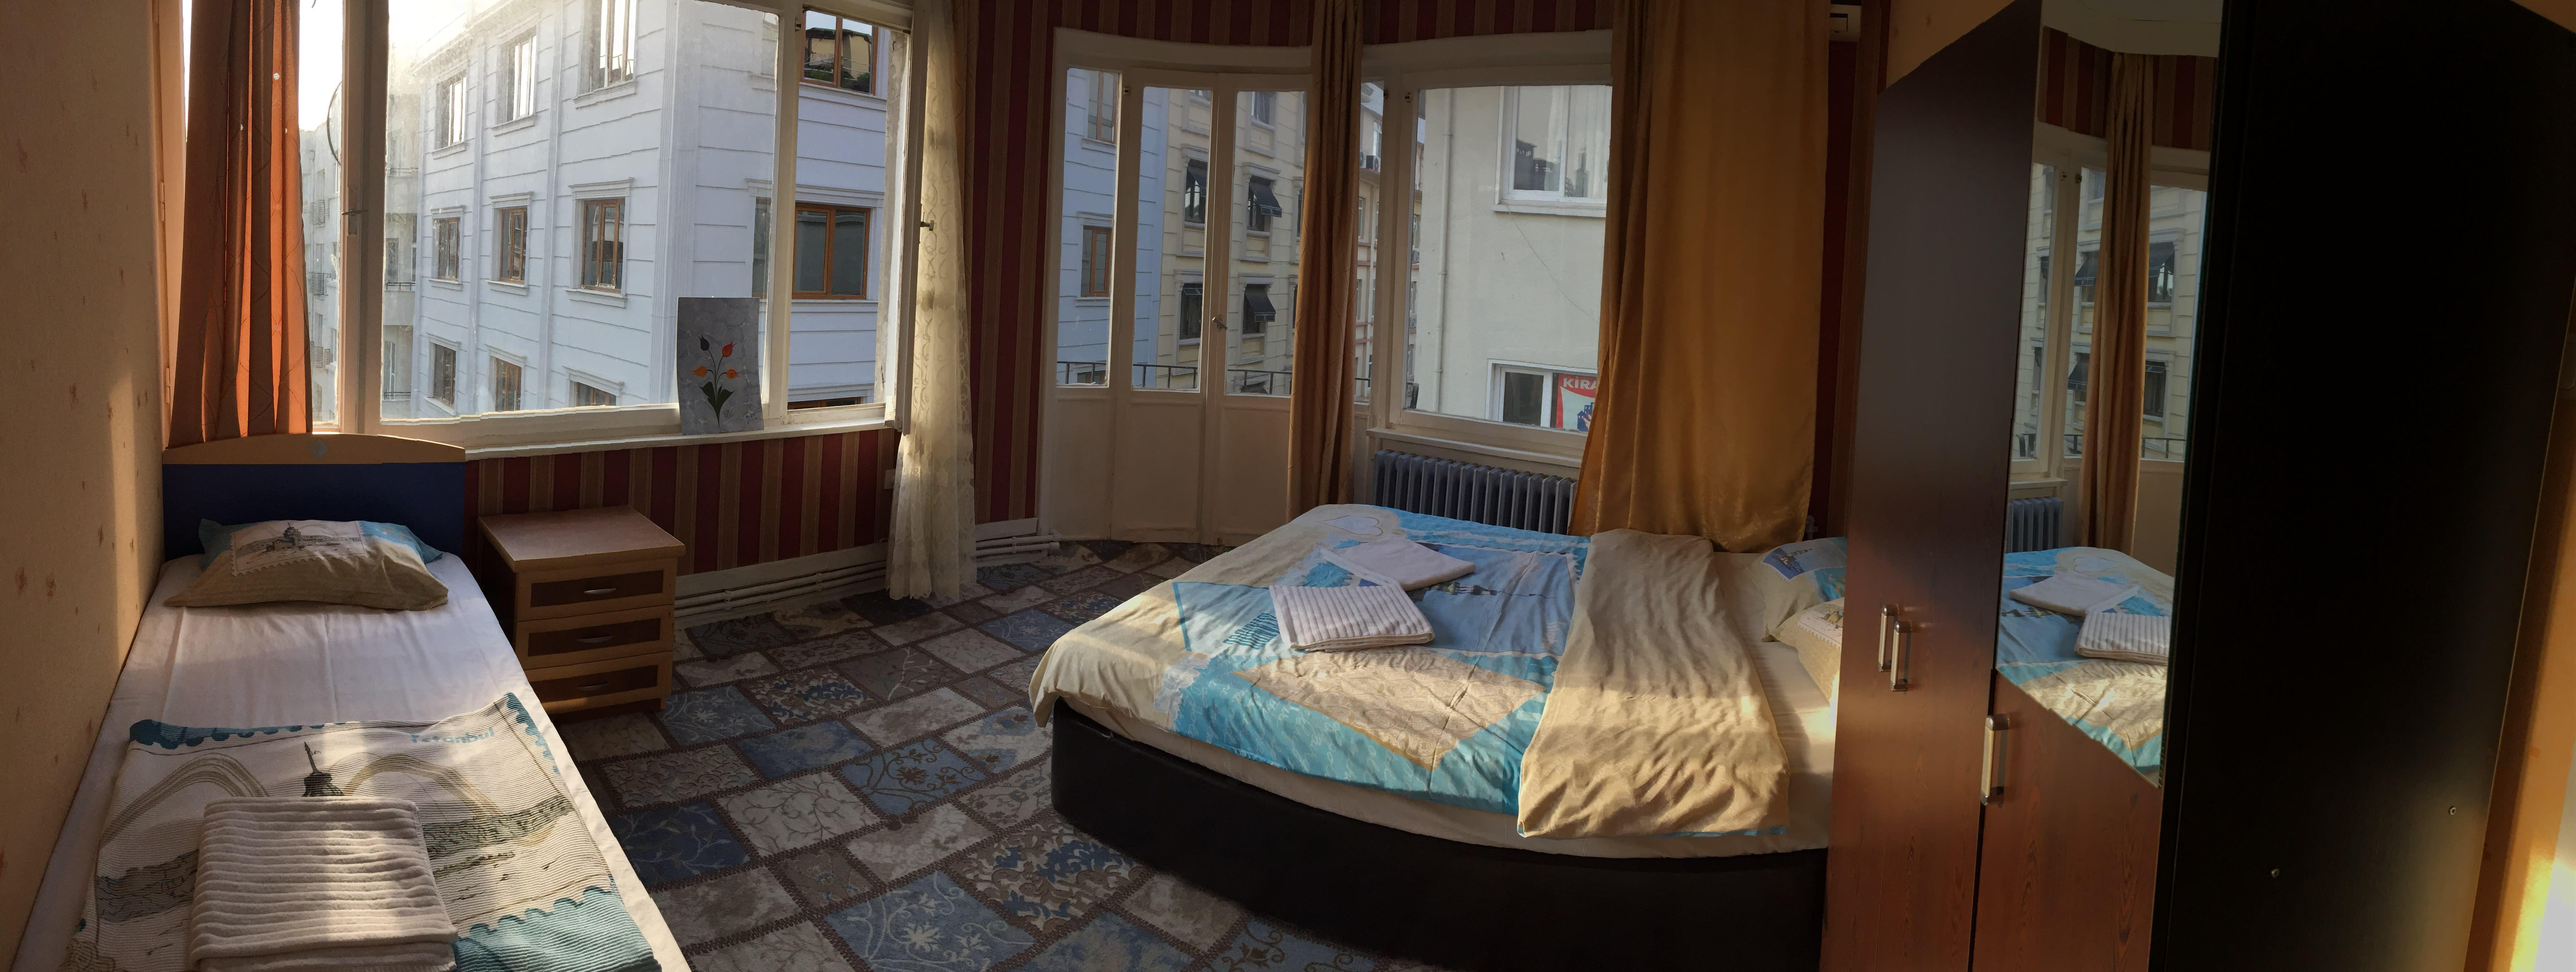 Castle Hostel Istanbul